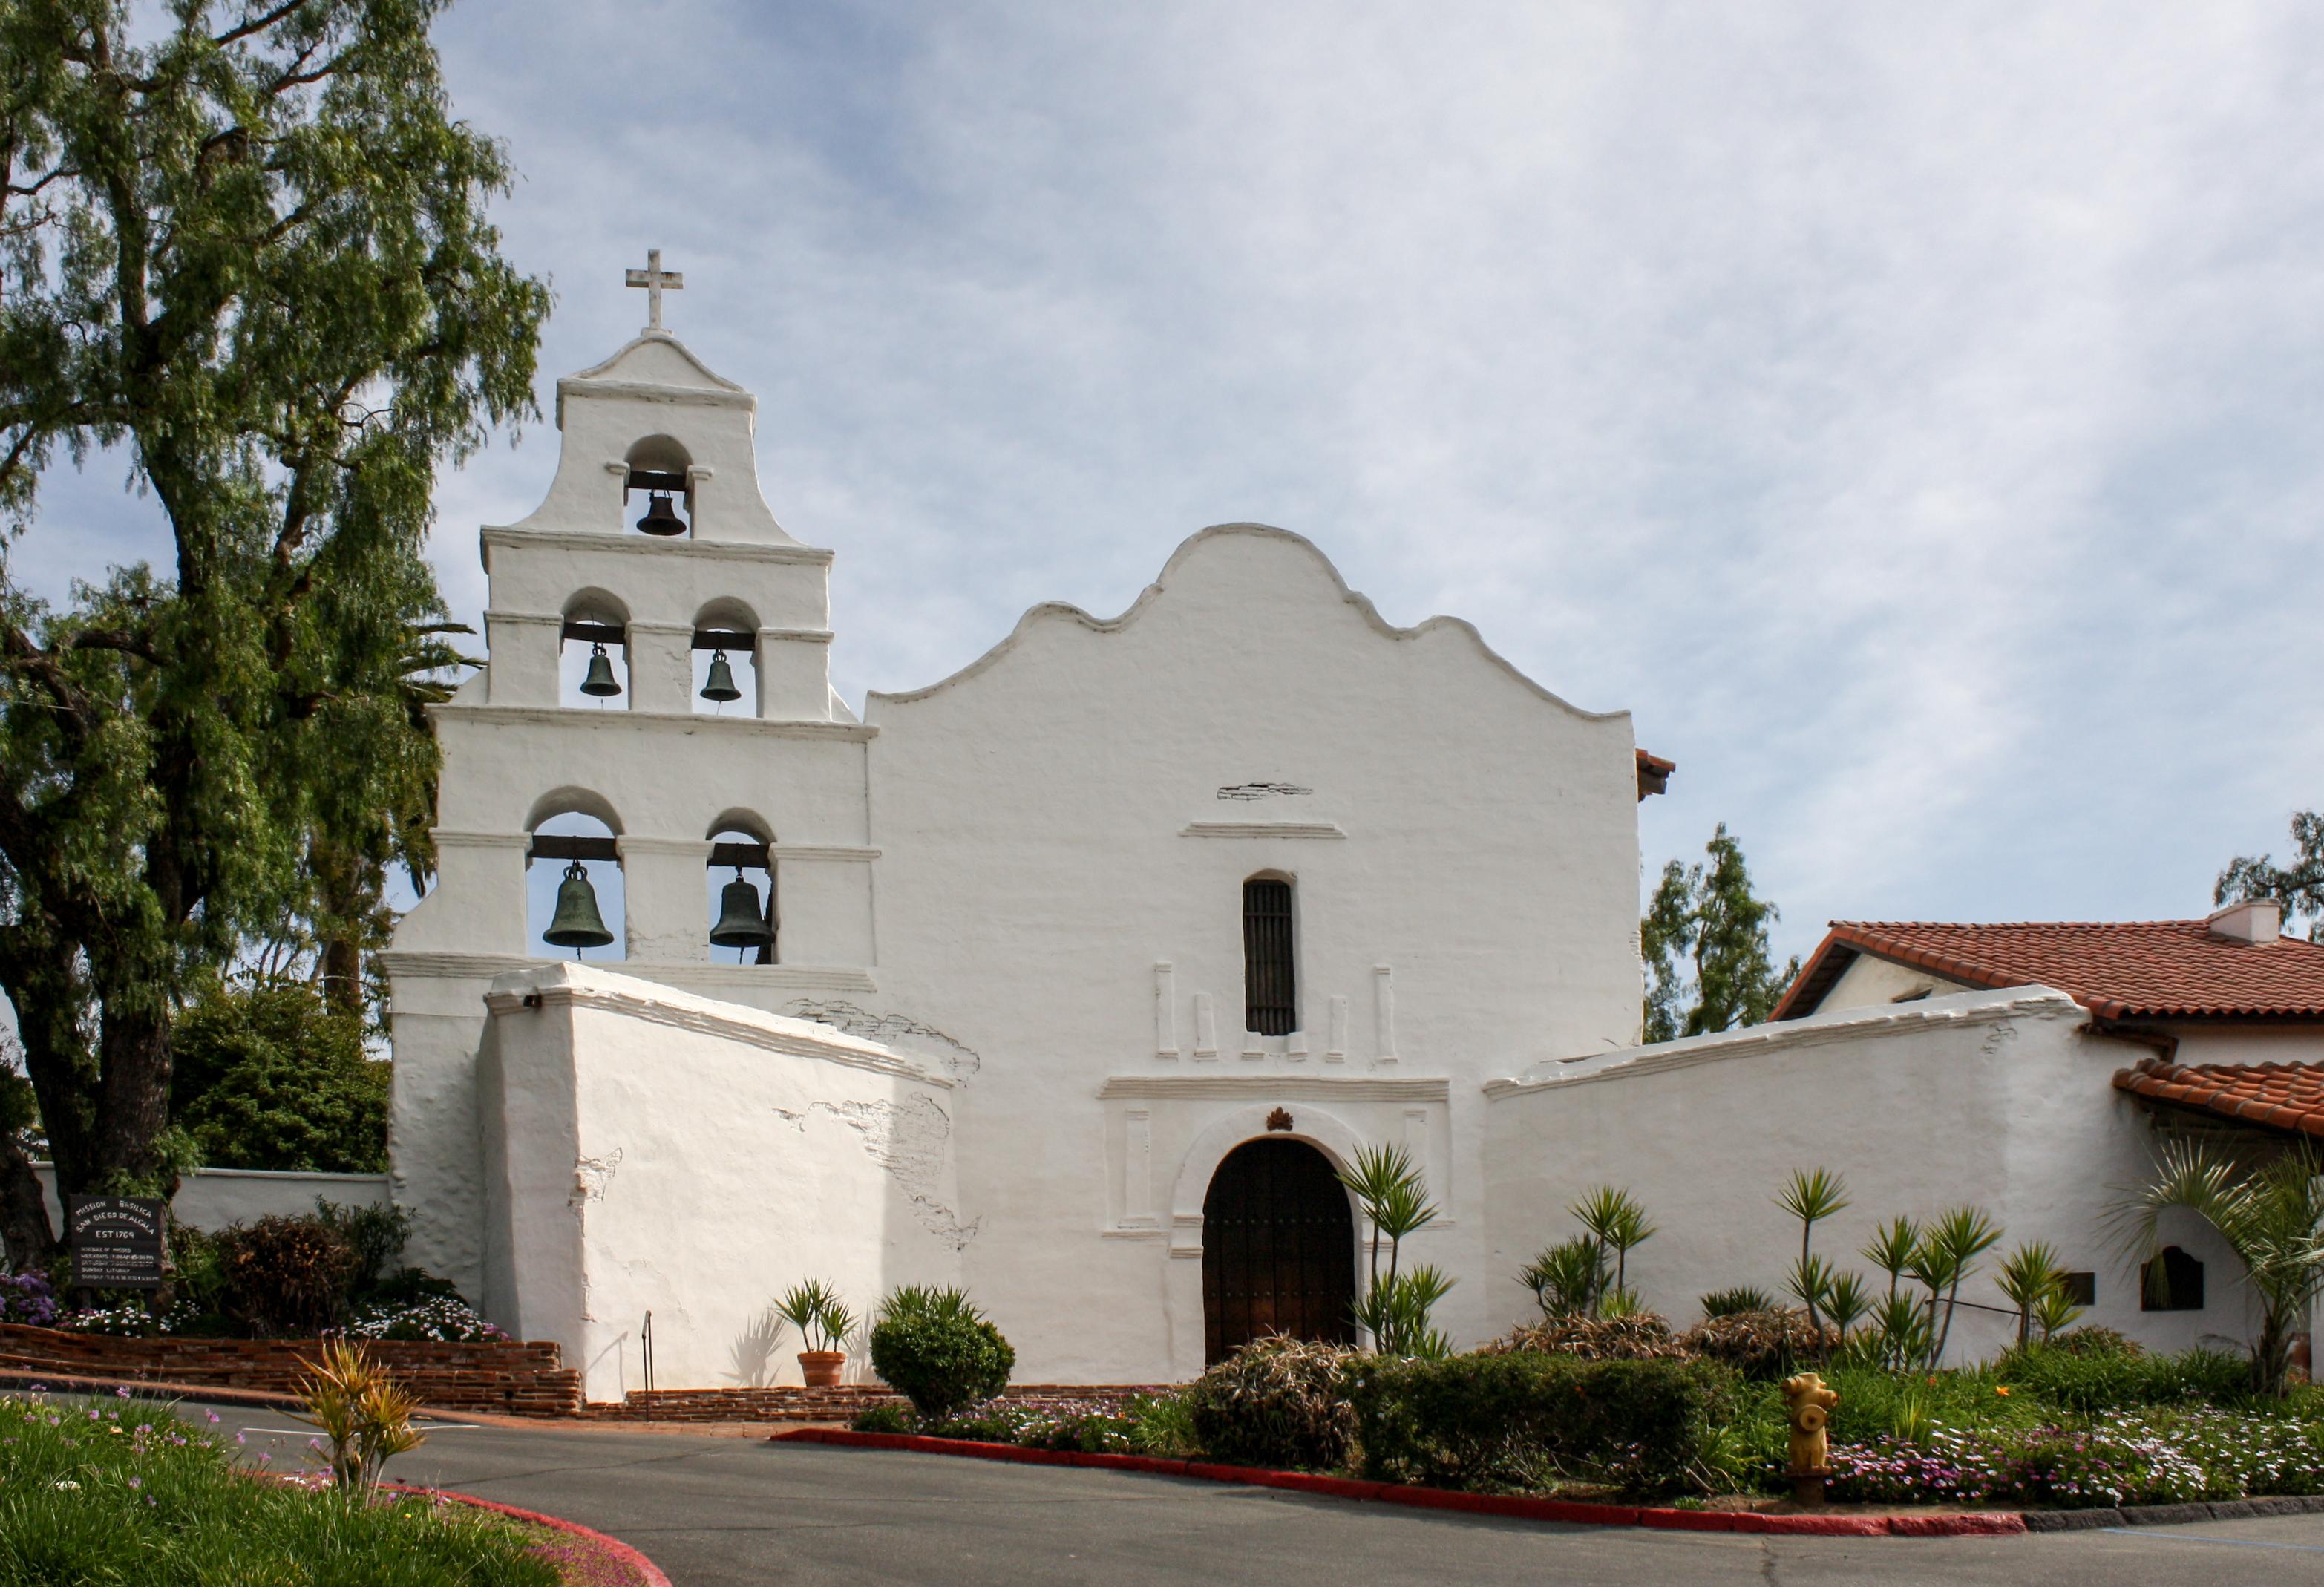 Mission San Diego de Alcala / Old Town San Diego Tour